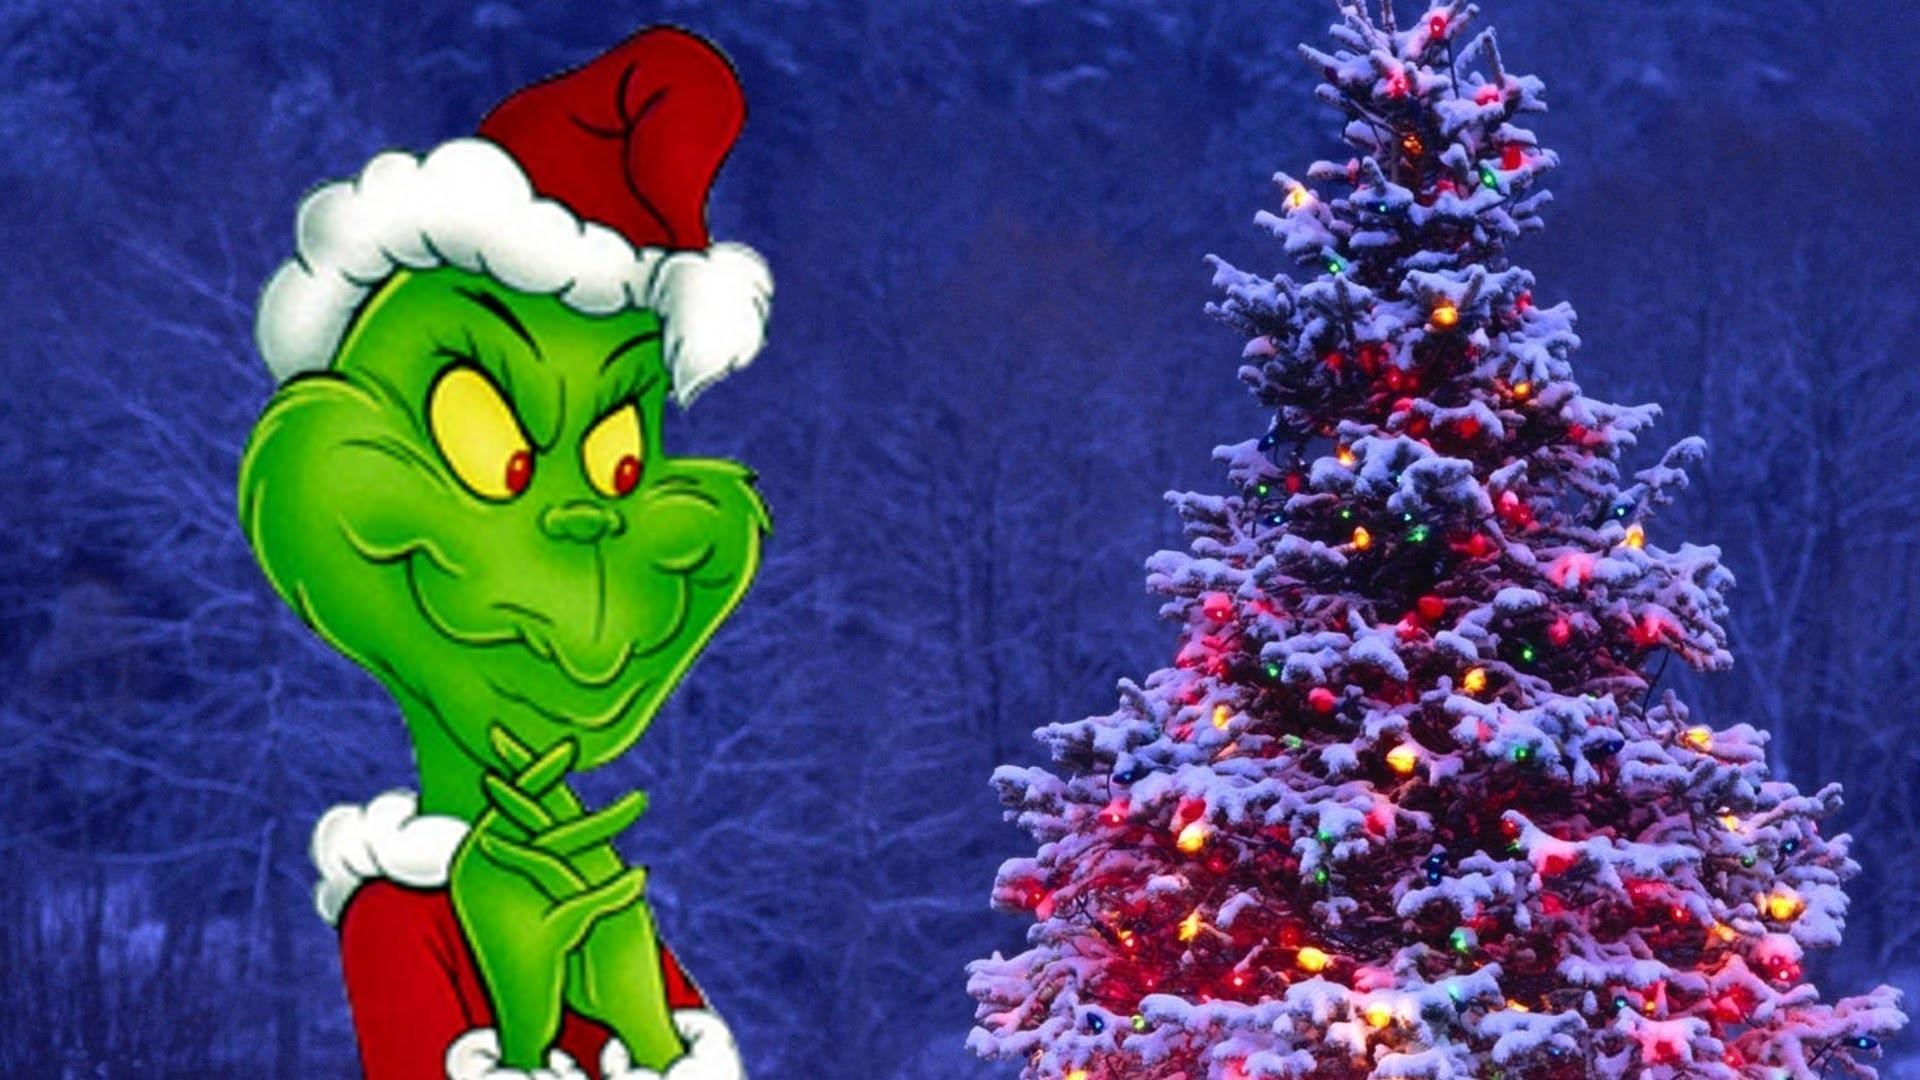 weihnachts grinch bilder - Weihnachts grinch bilder